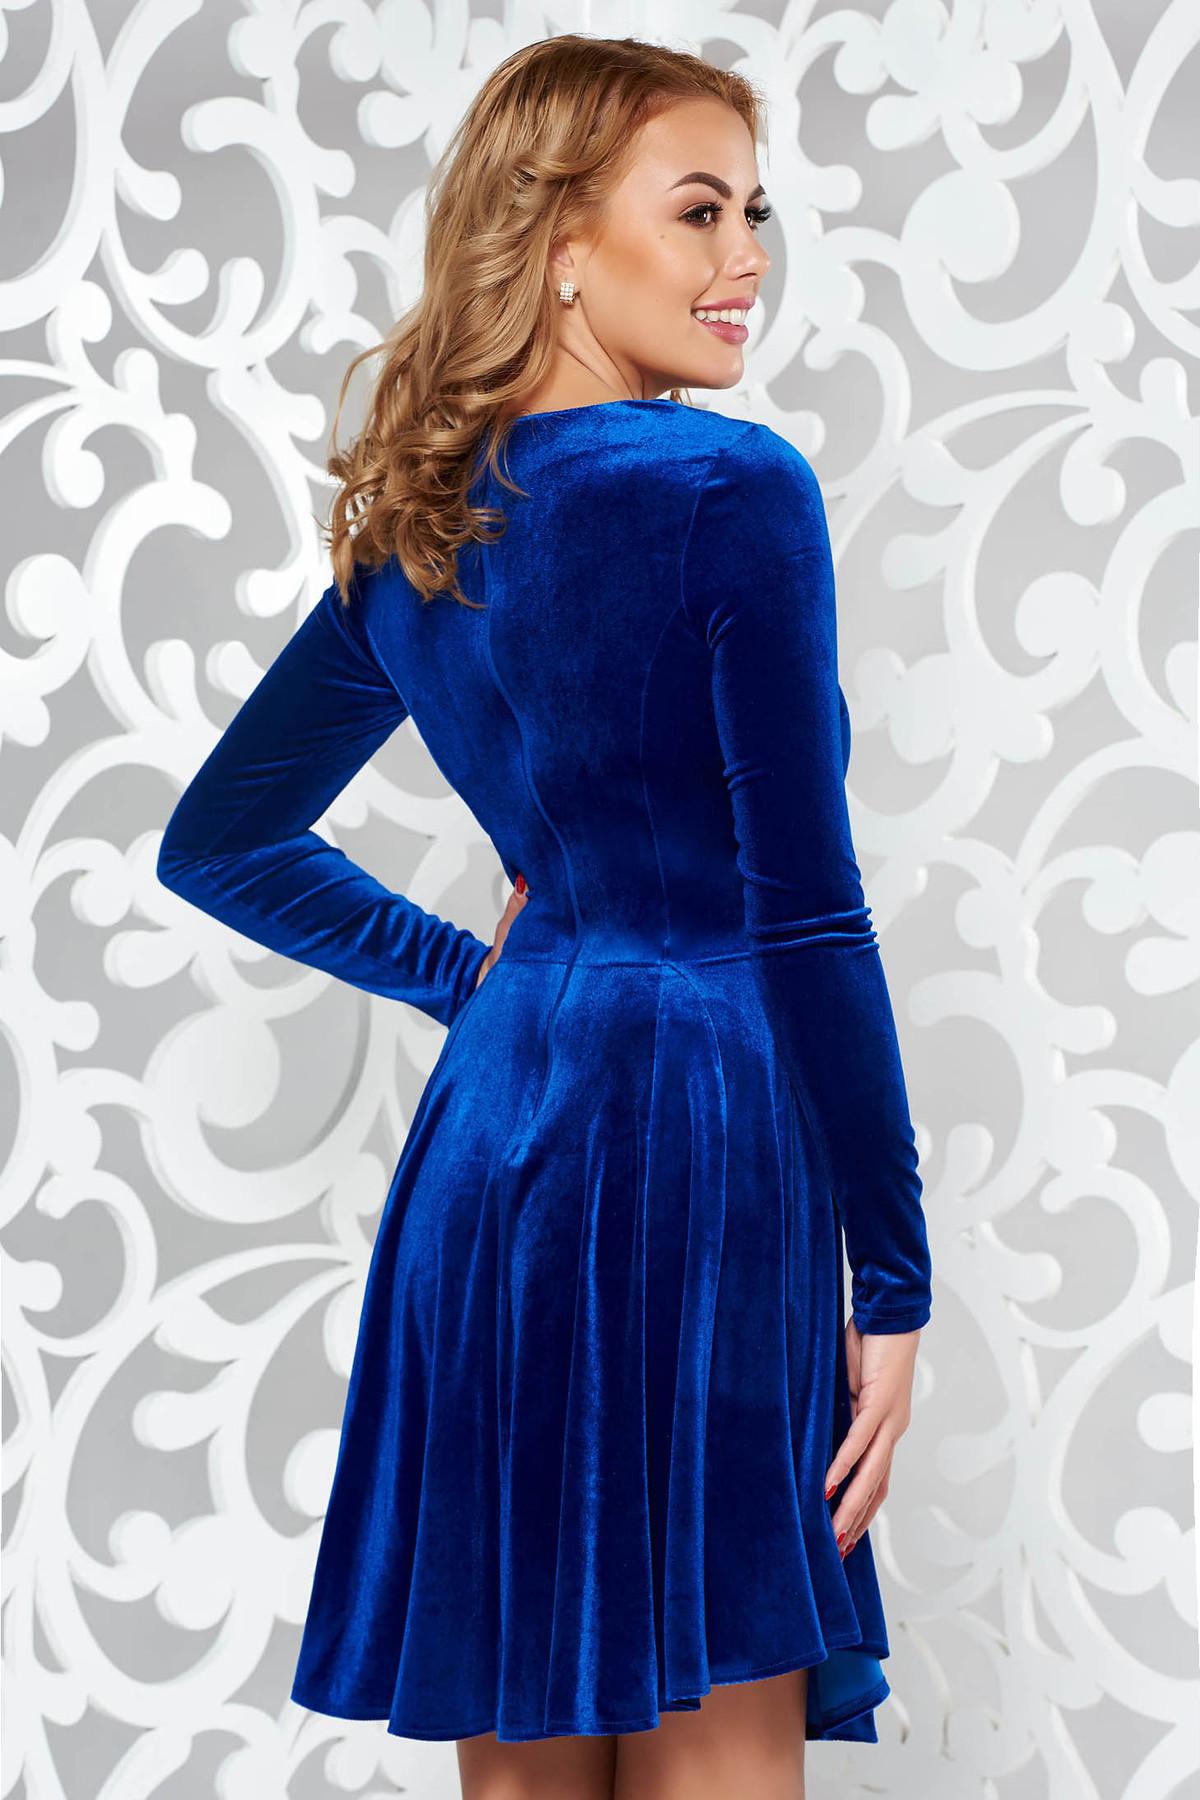 Rochie Artista albastra de ocazie in clos din catifea cu insertii de broderie